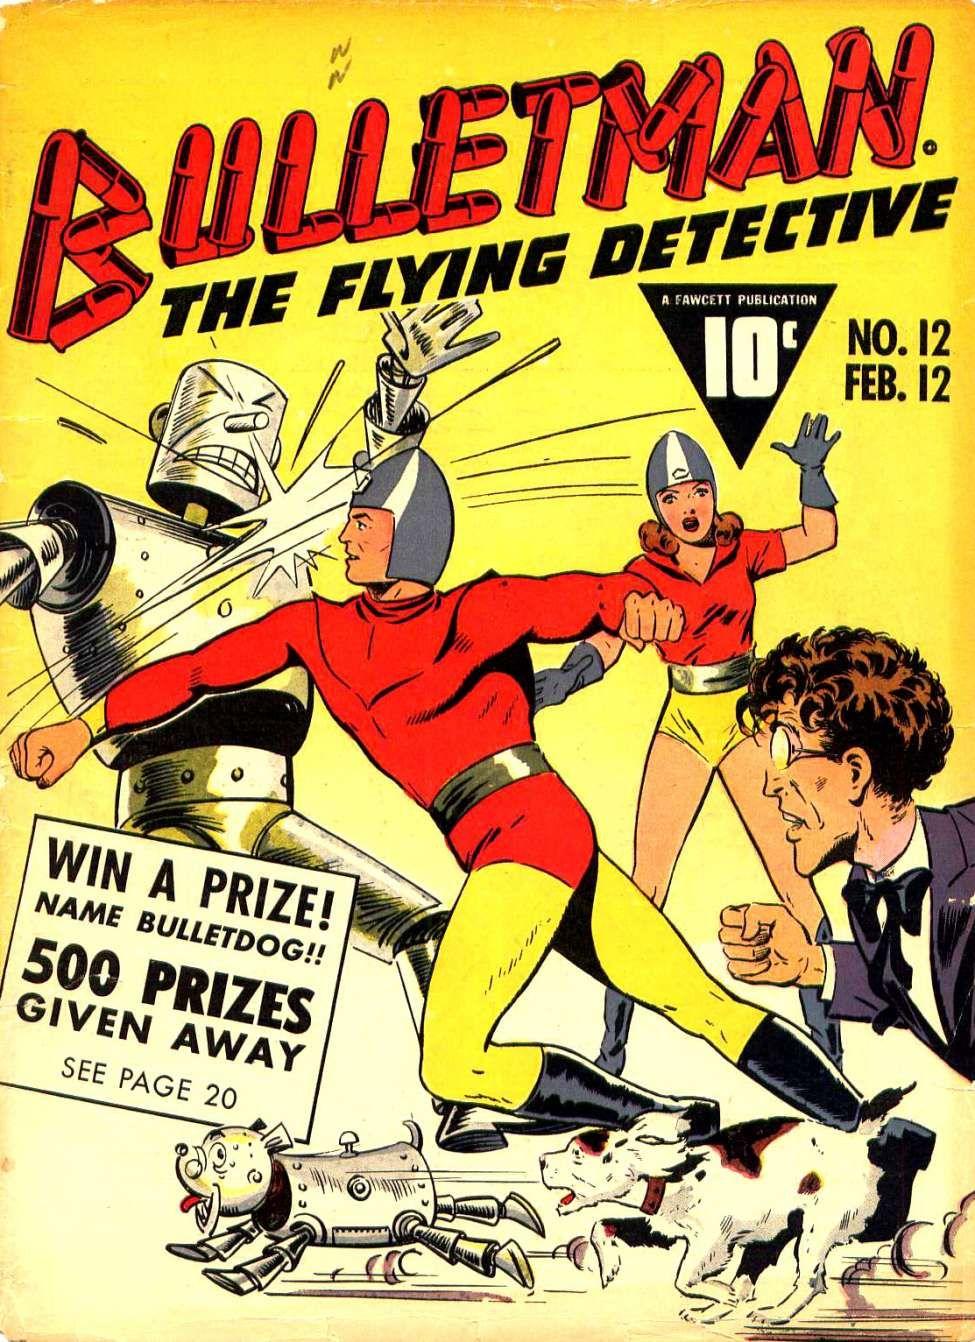 Bulletman (and Bullet'girl')